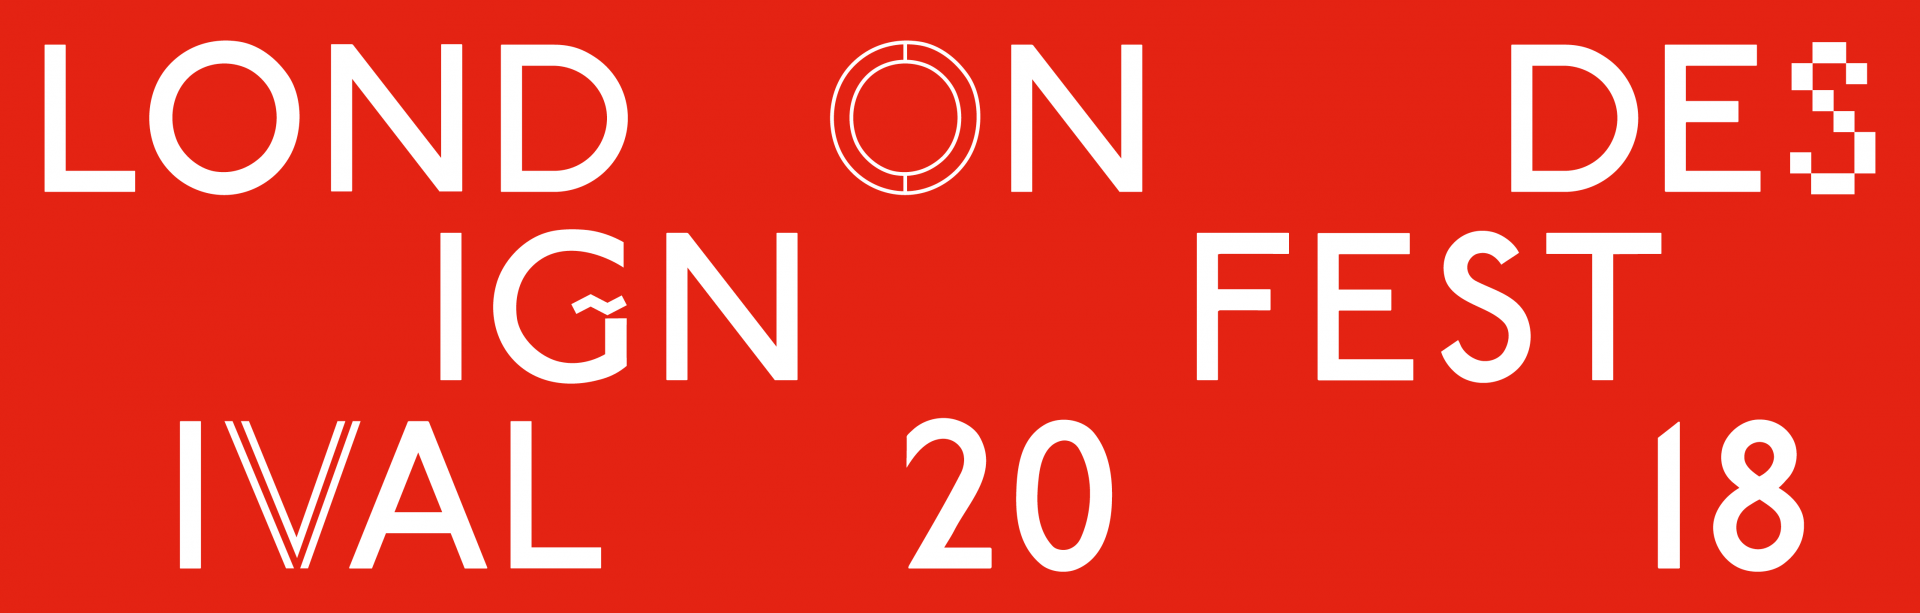 Storey supports the Emerging Design Medal at London Design Festival